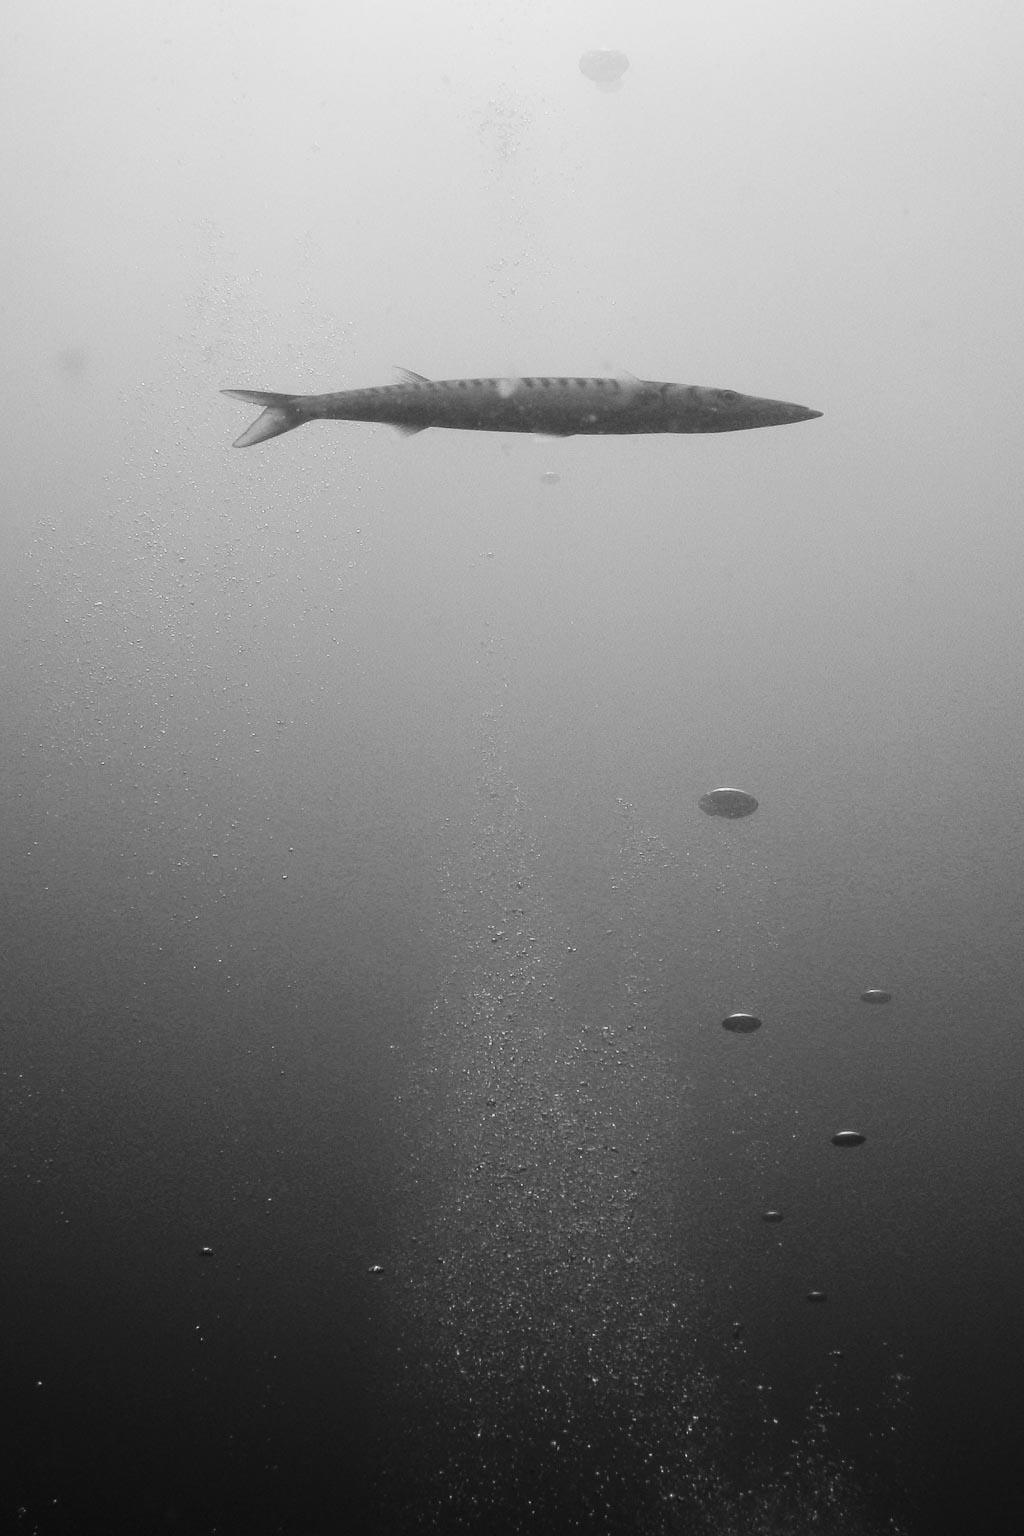 barracuda2.jpg